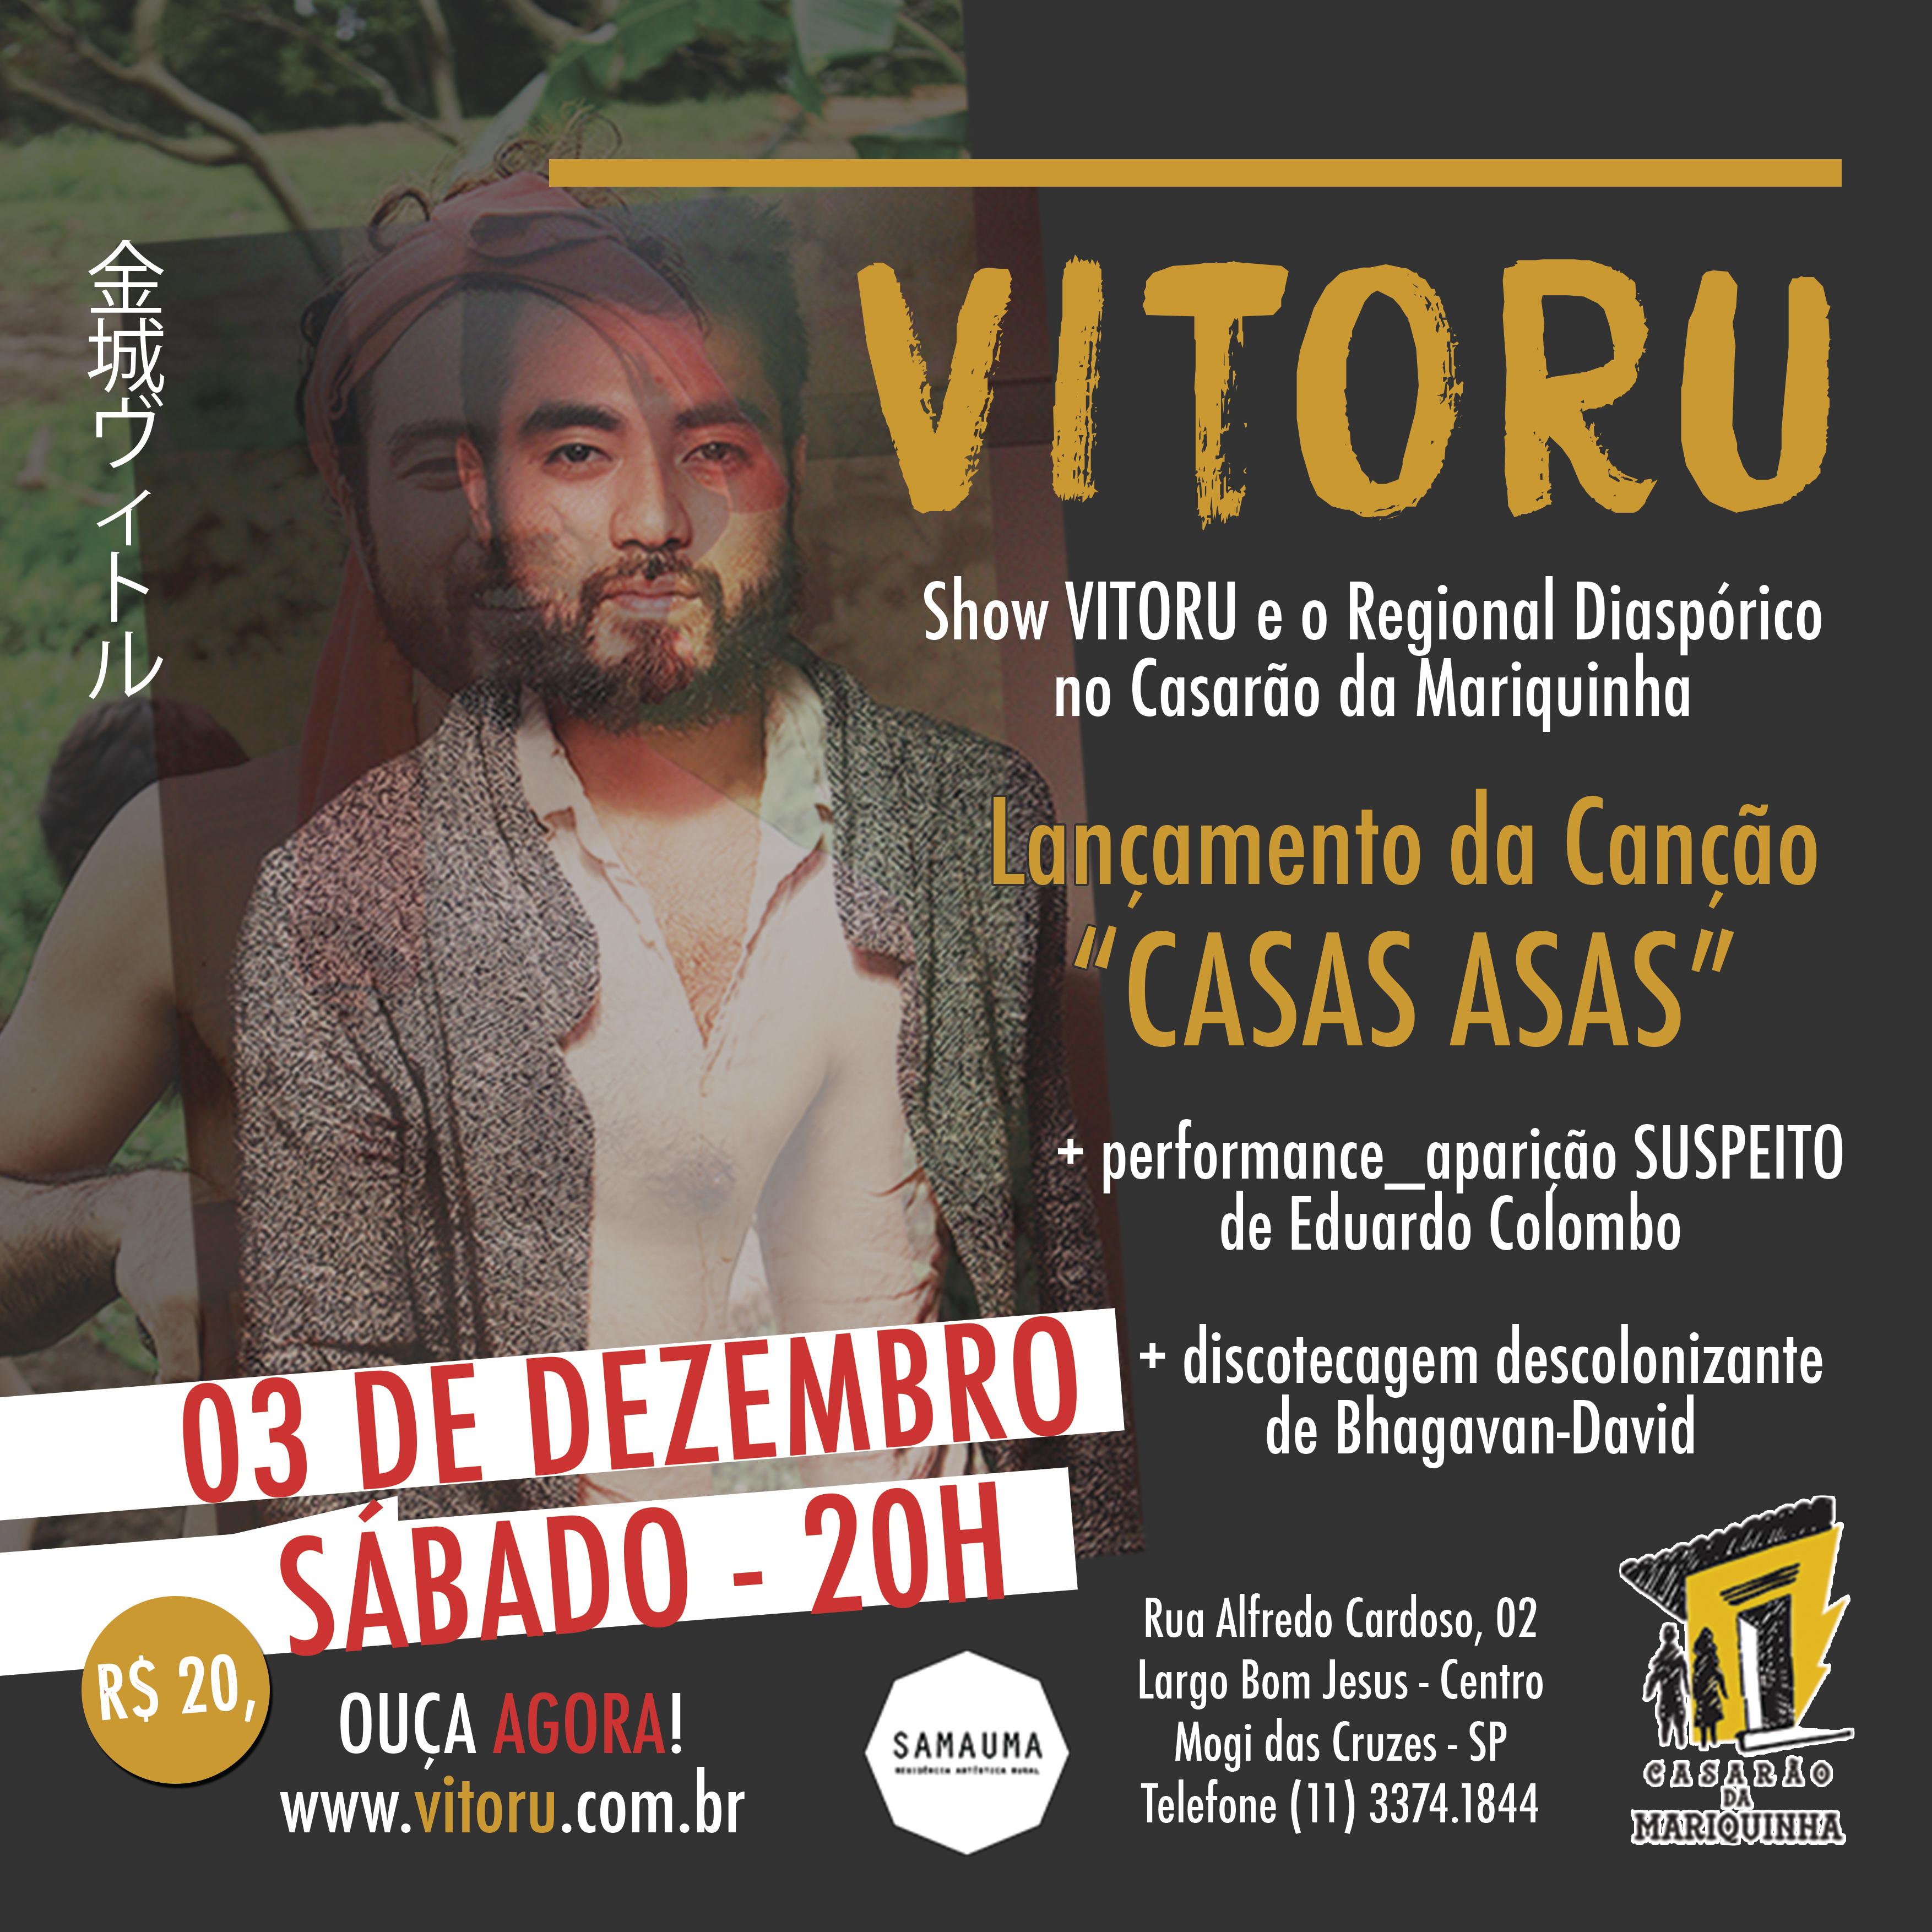 VITORU e Regional Diaspórico